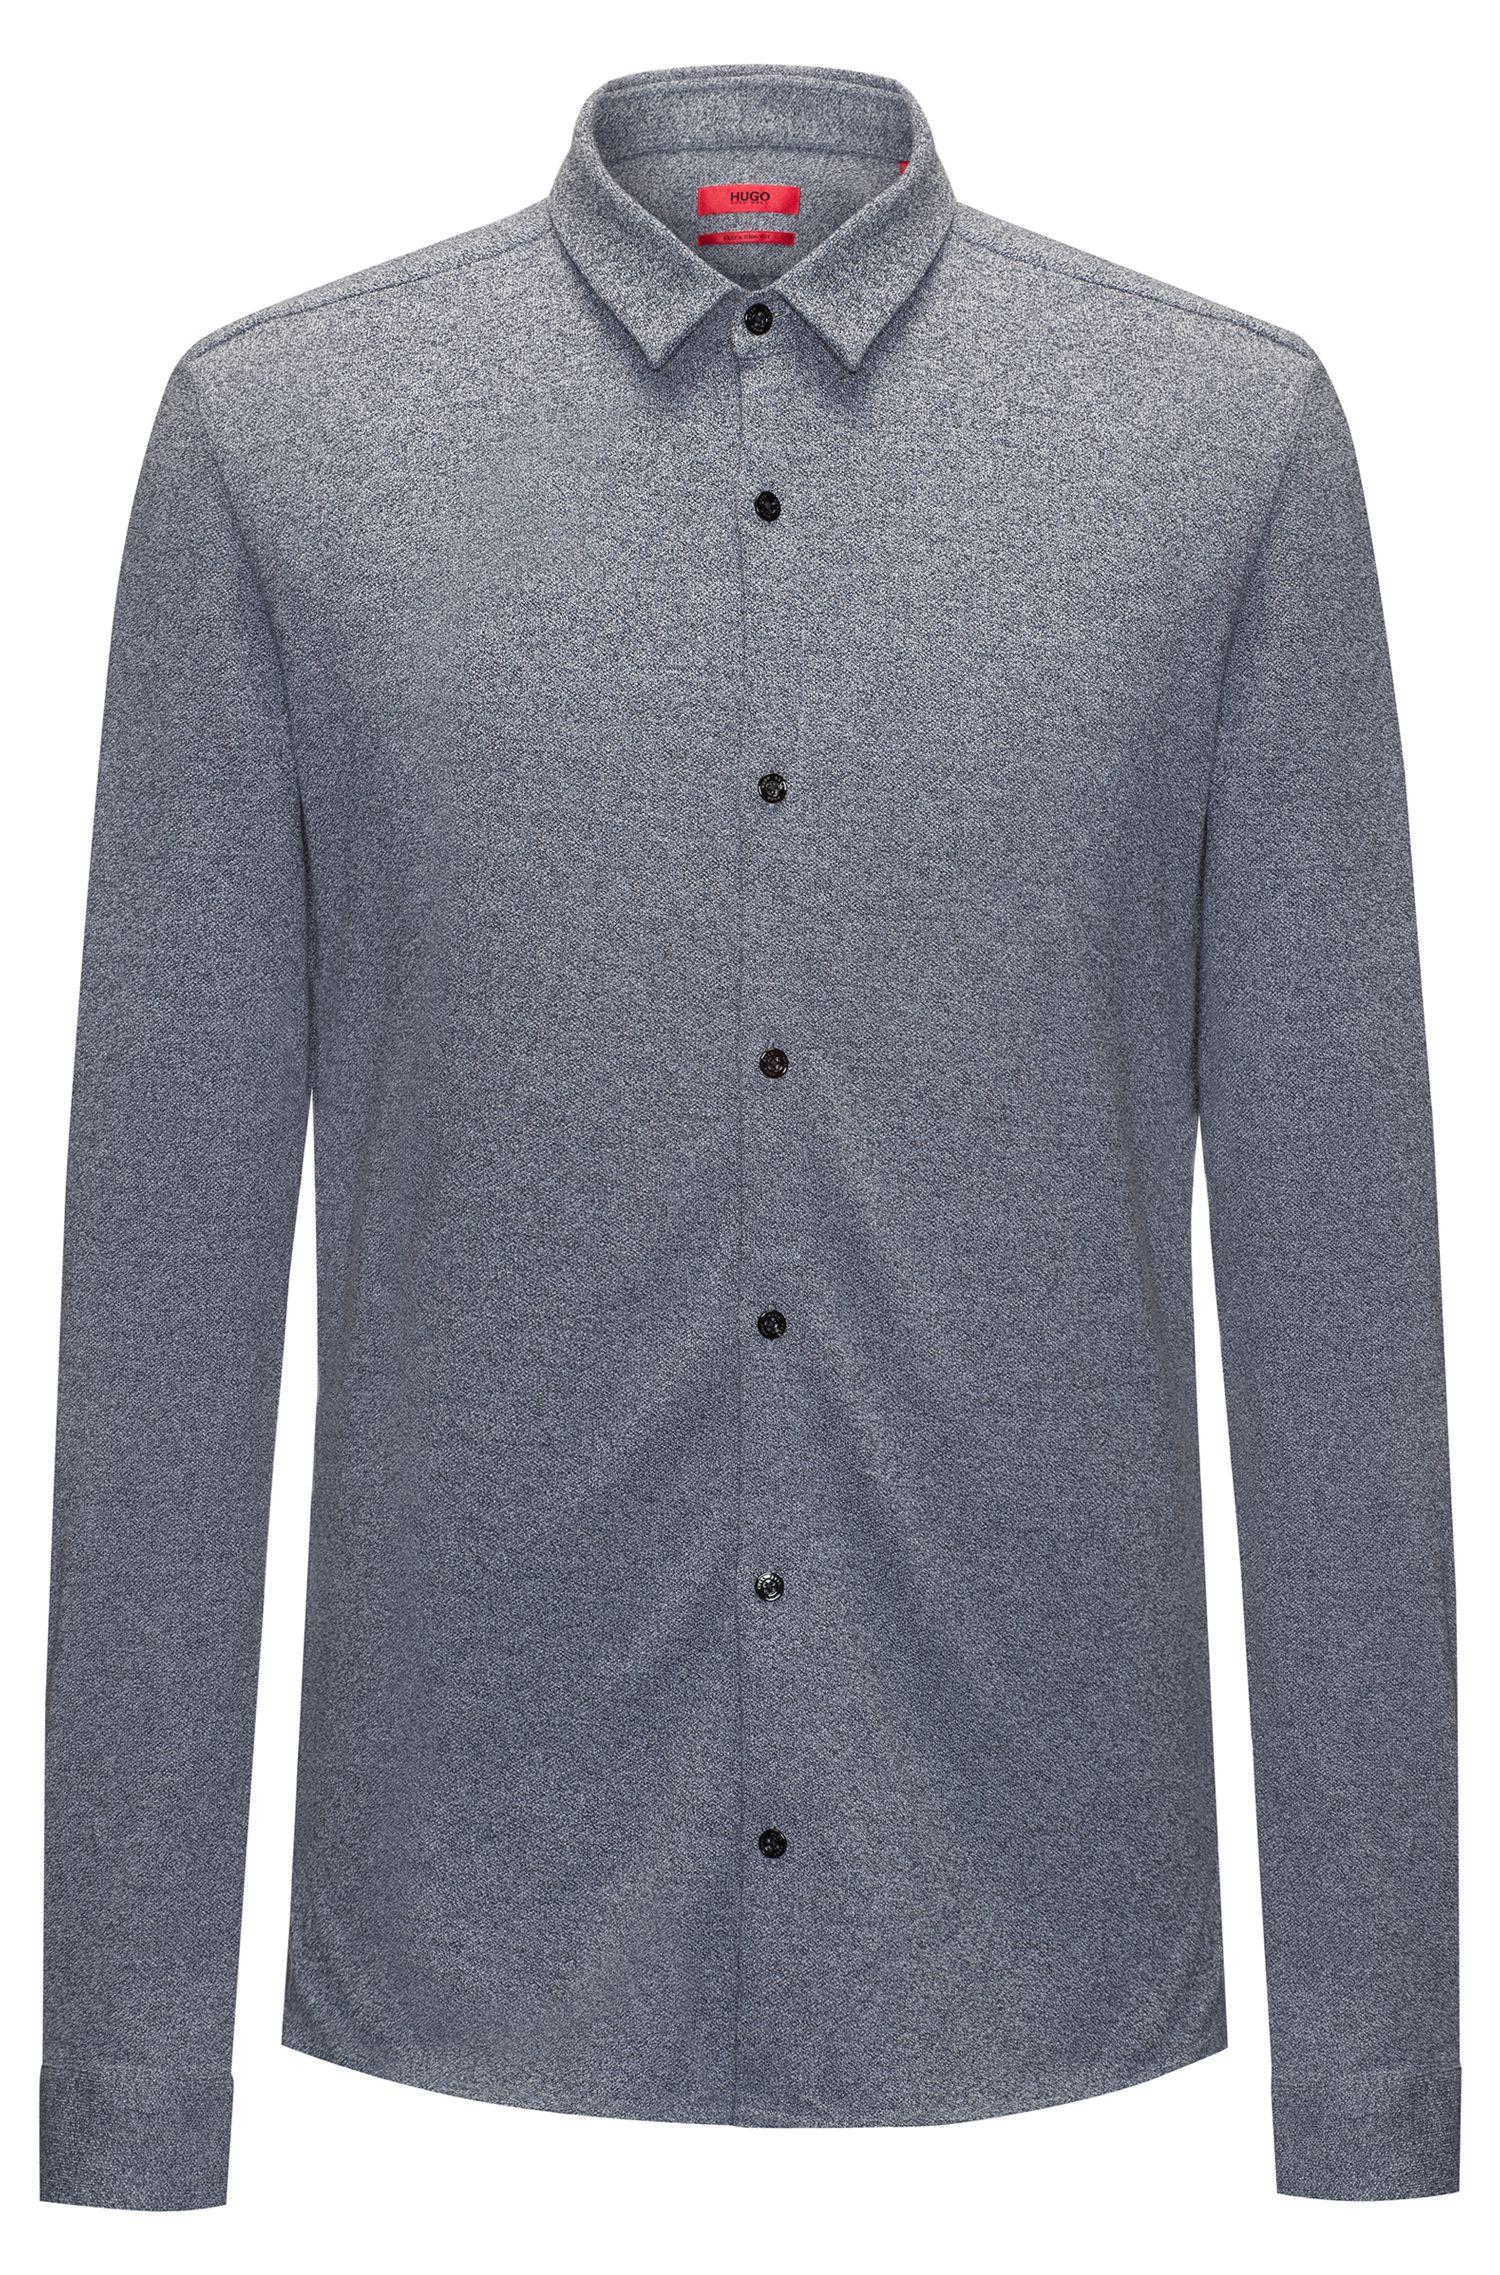 Heathered Cotton Jersey Sport Shirt, Extra Slim Fit | Ero W, Dark Blue